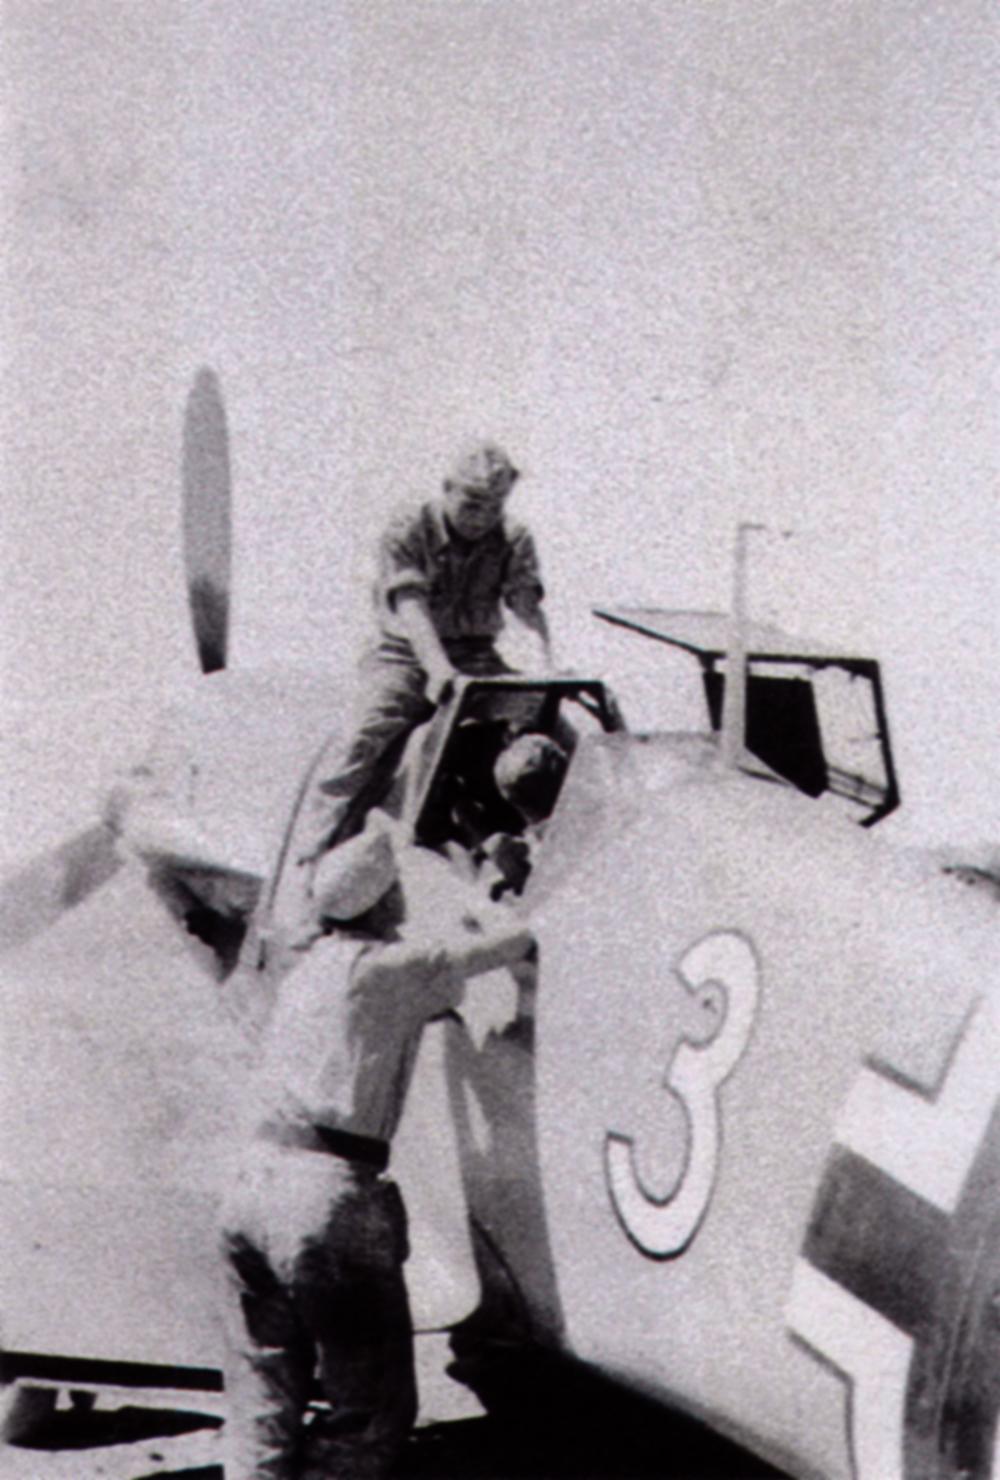 Messerschmitt Bf 109F4Trop 1.JG27 White 3 North Africa 1941 01